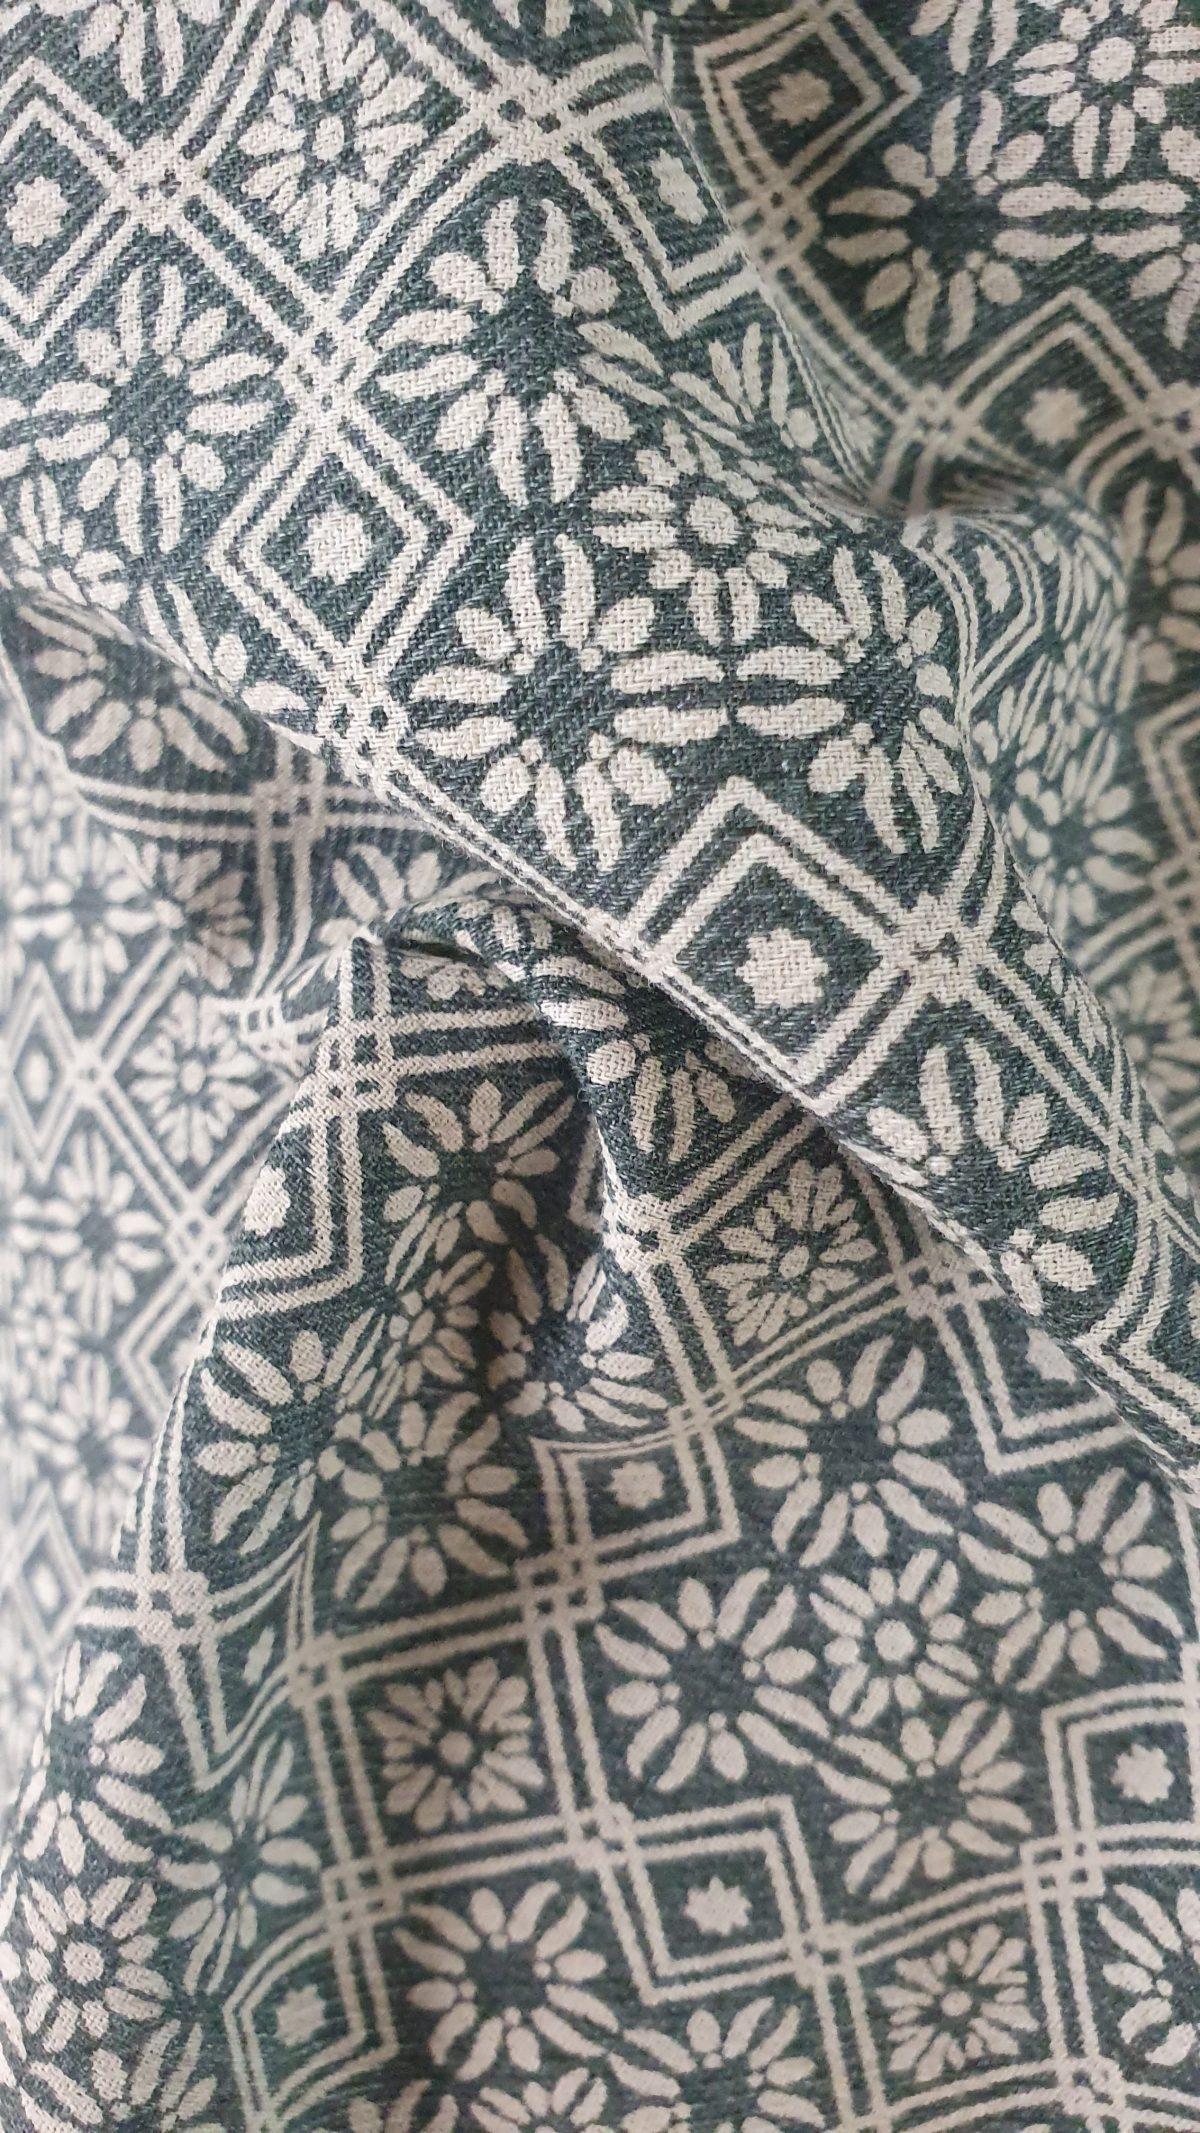 Linen Jacquard Printed 150cm - 07